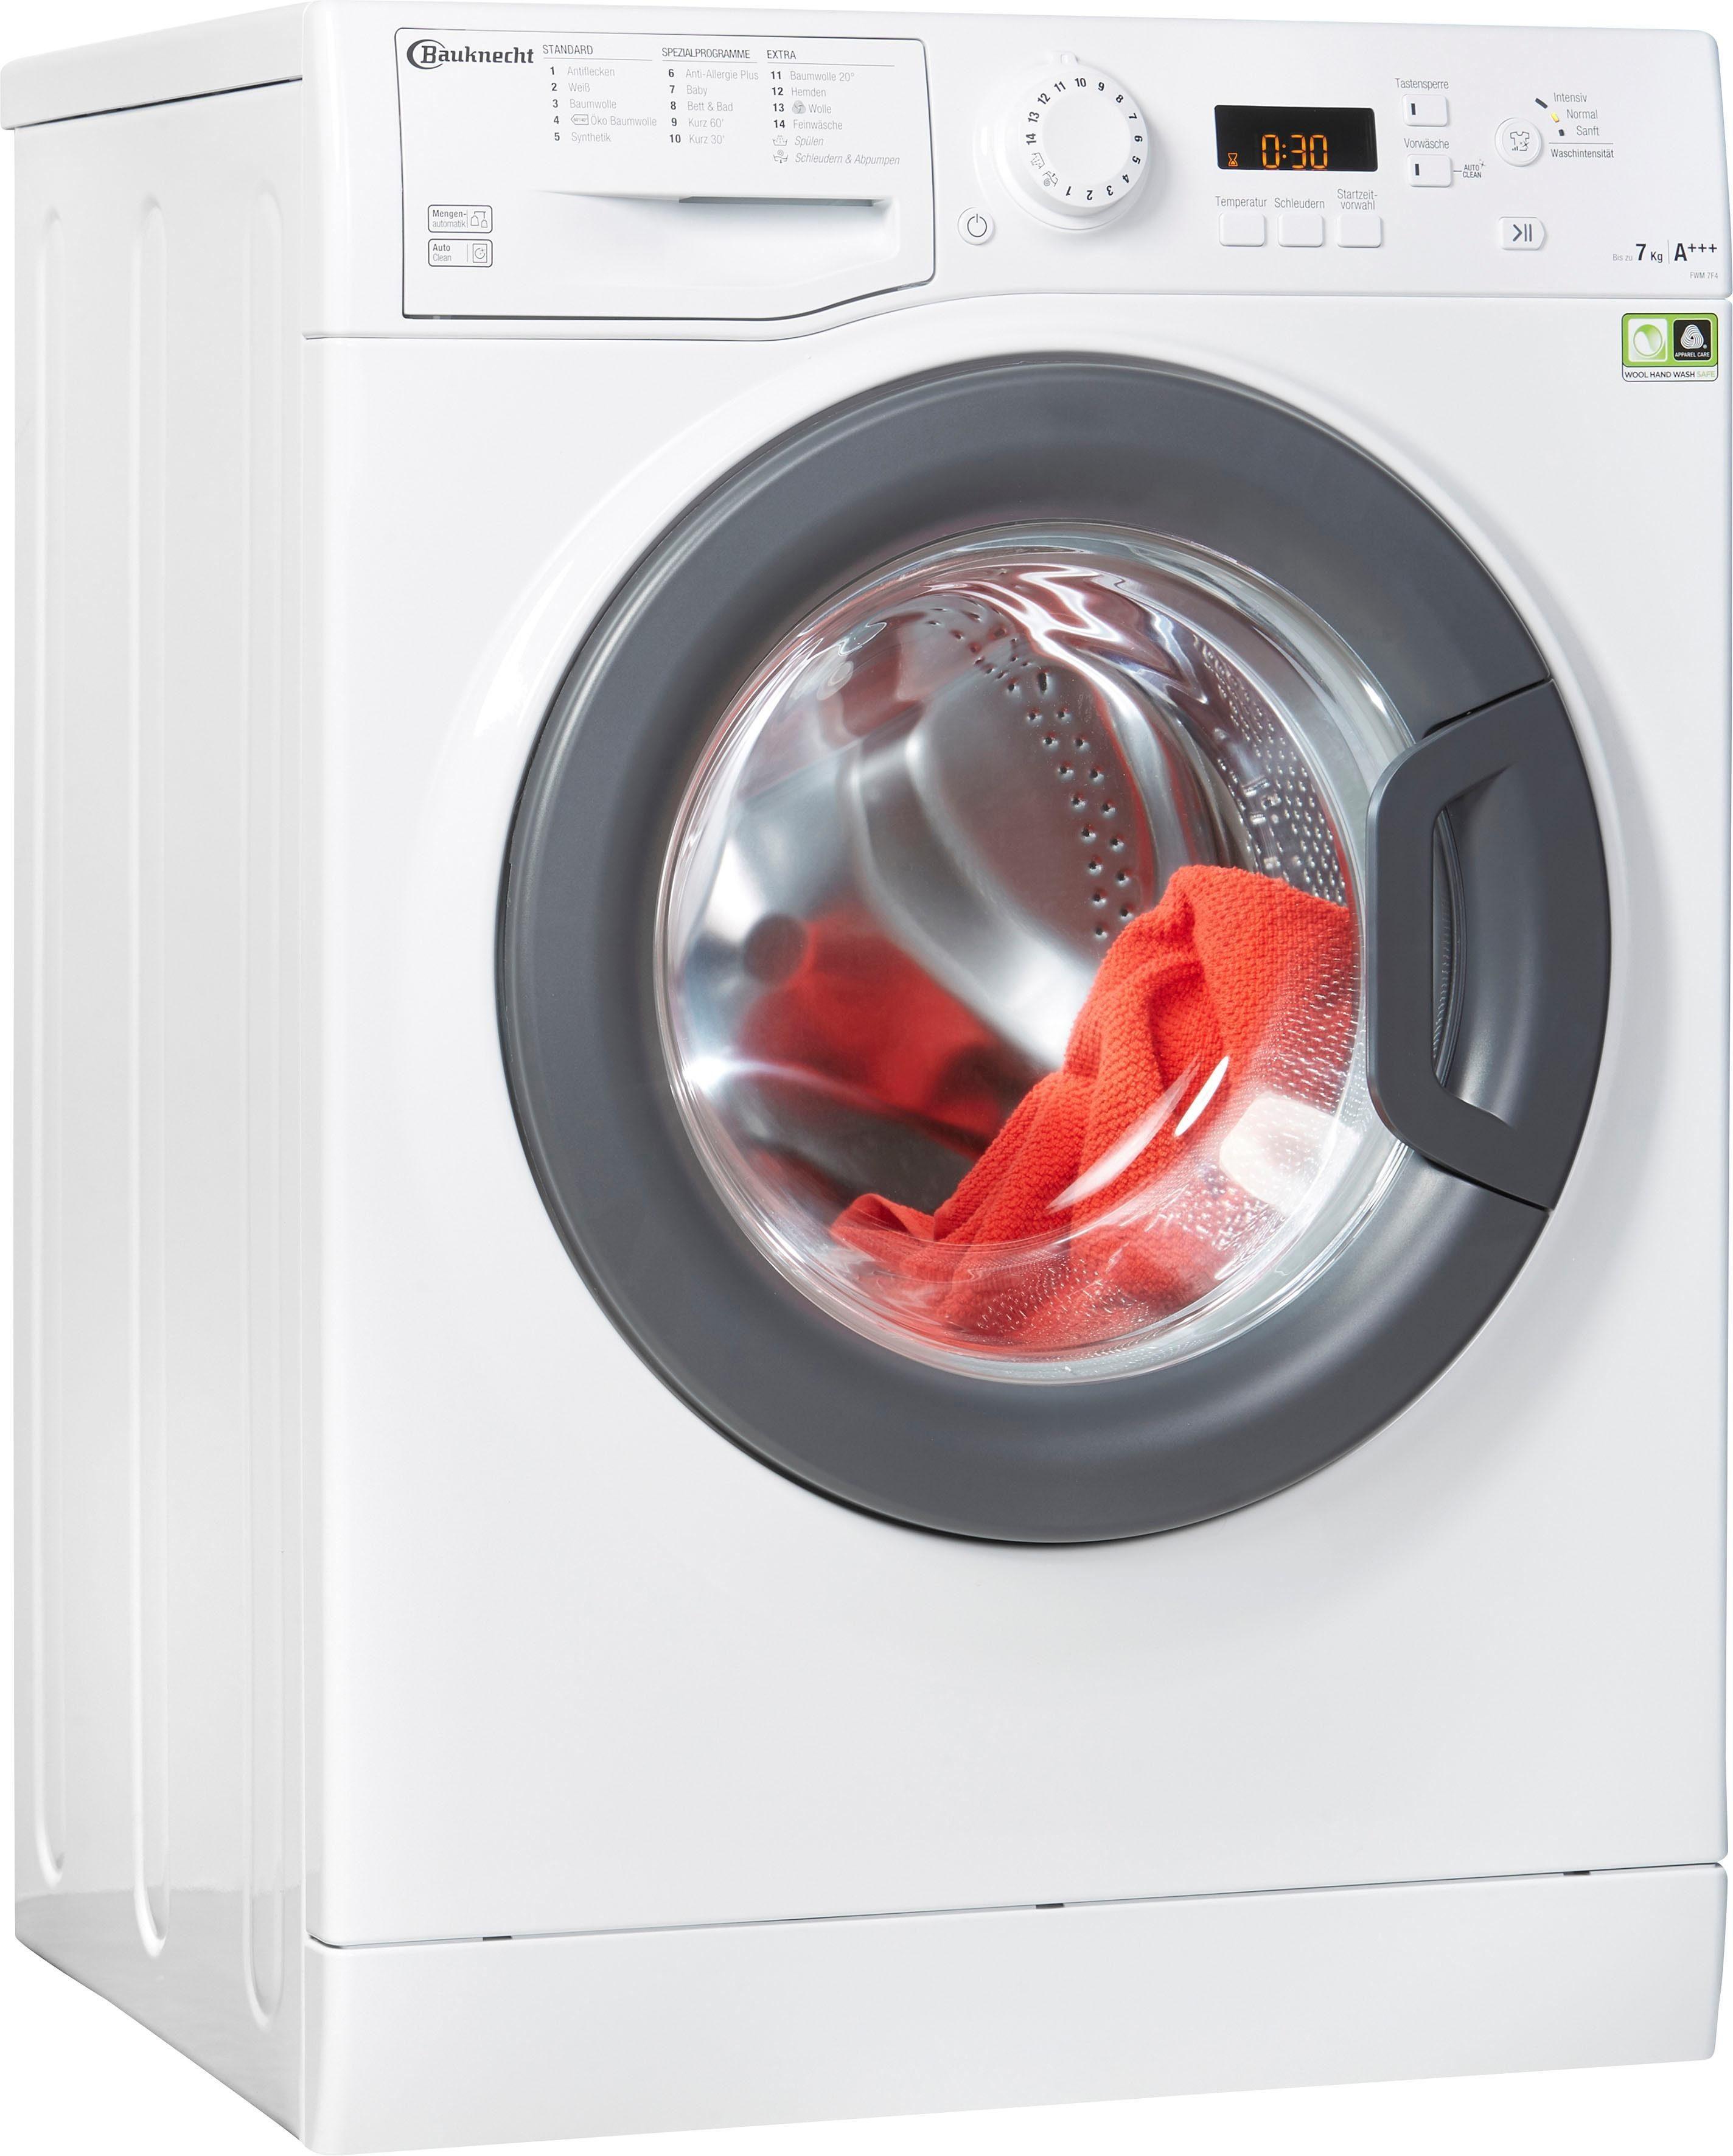 BAUKNECHT Waschmaschine FWM FWM 7F4, 7 kg, 1400 U/Min